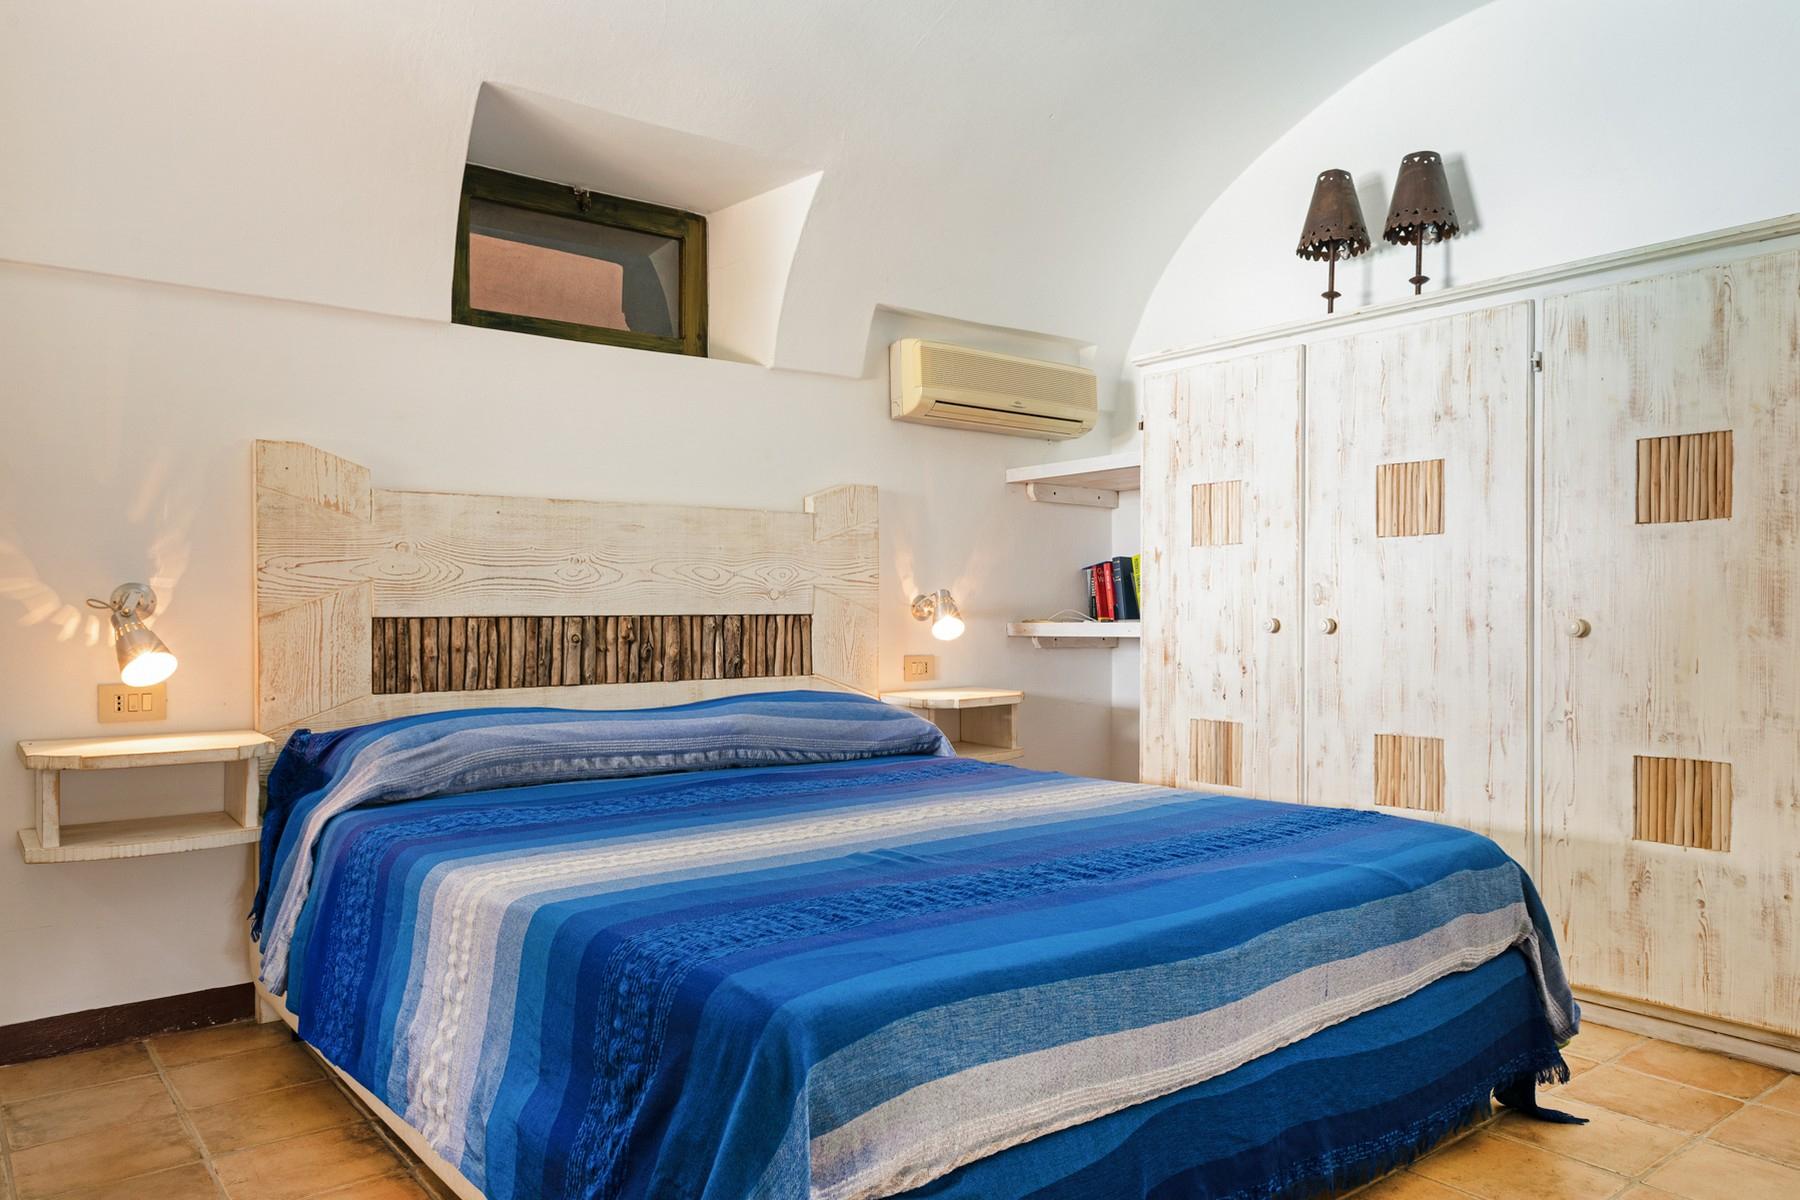 Villa in Vendita a Pantelleria: 5 locali, 82 mq - Foto 7